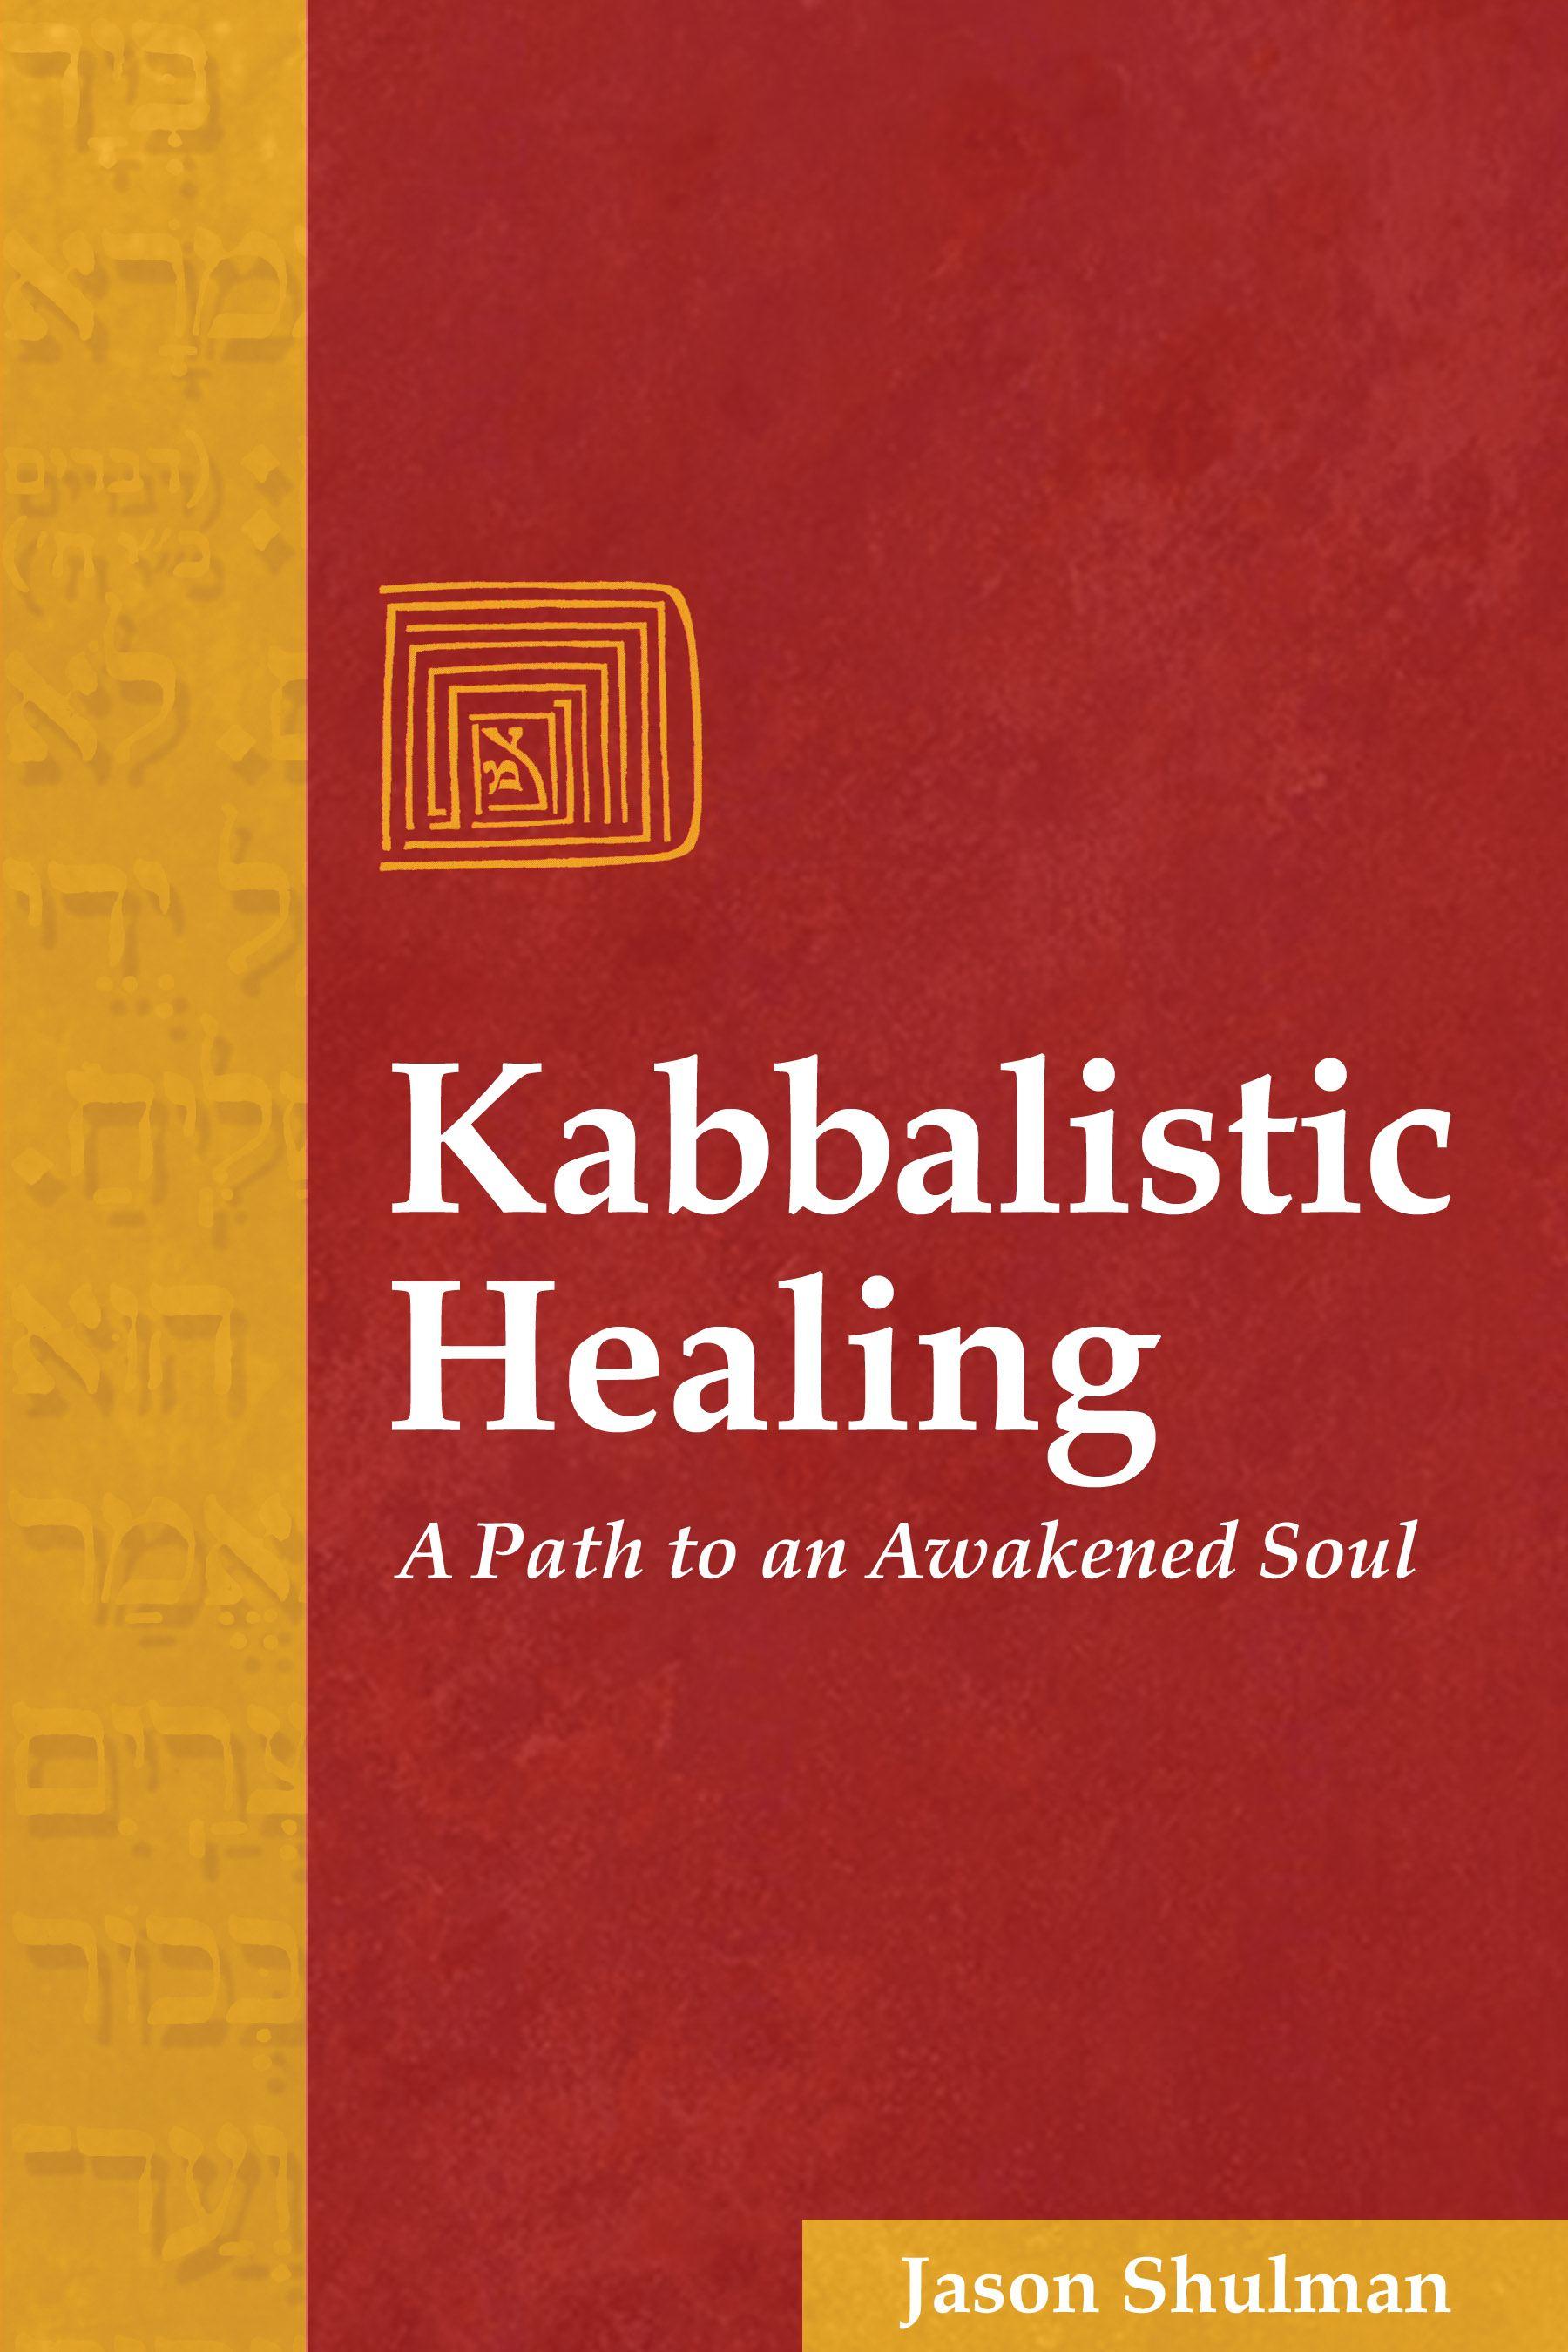 Kabbalistic healing 9781594770159 hr